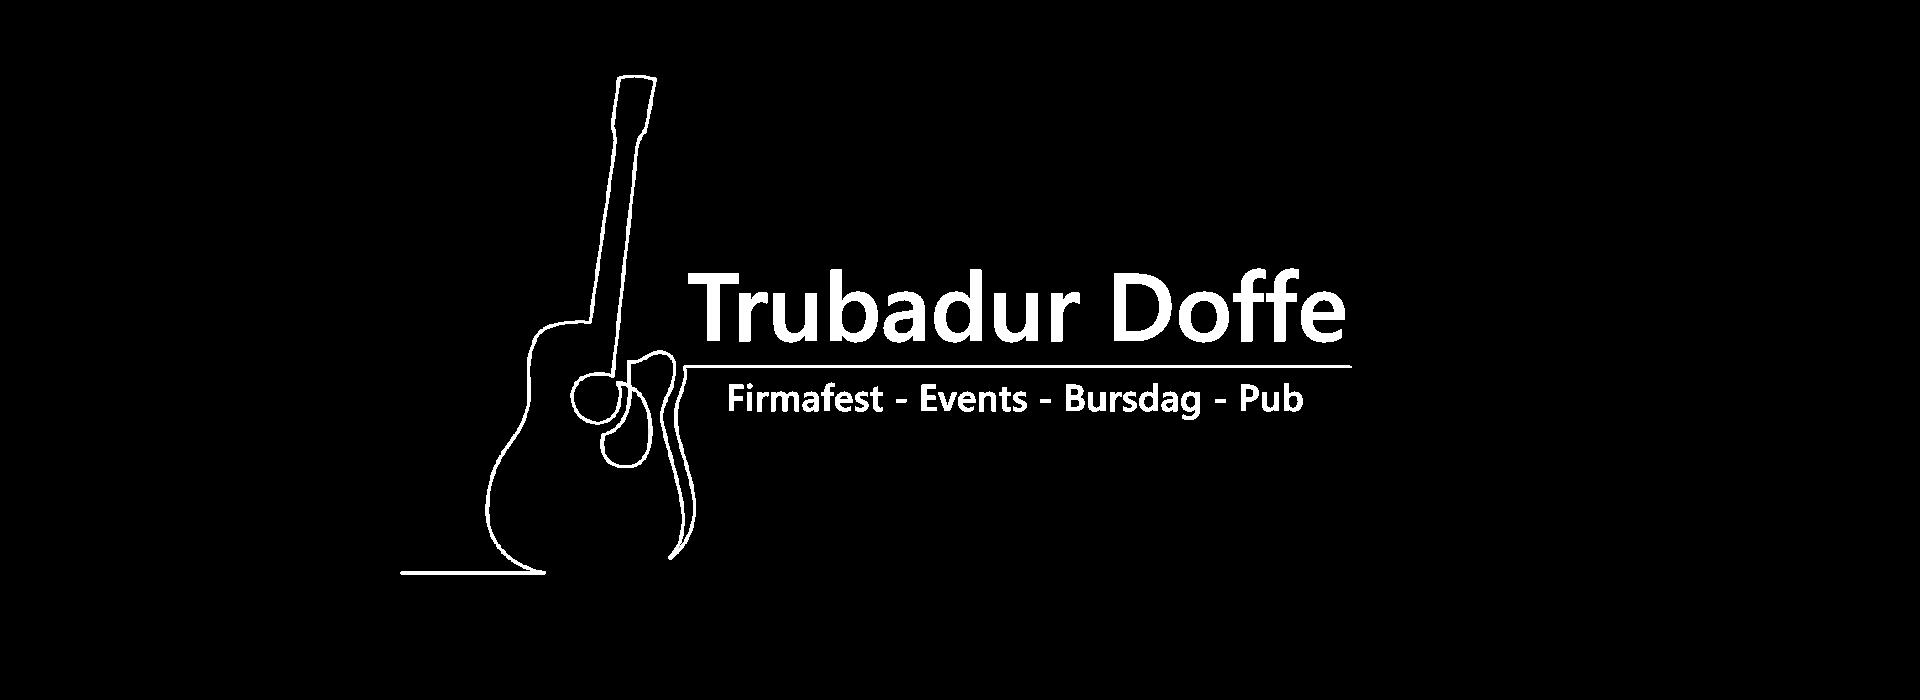 Trubadur Doffe forsidelogo